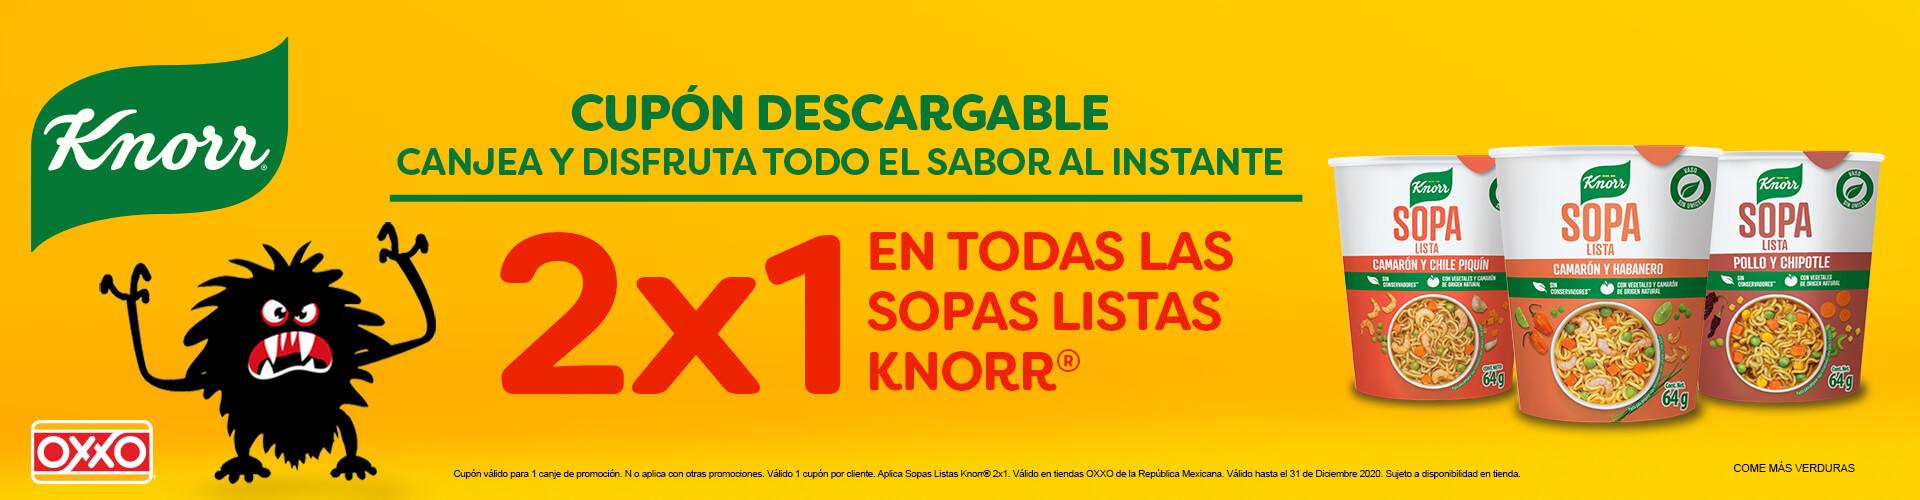 OXXO Promociones Knorr P12 2020